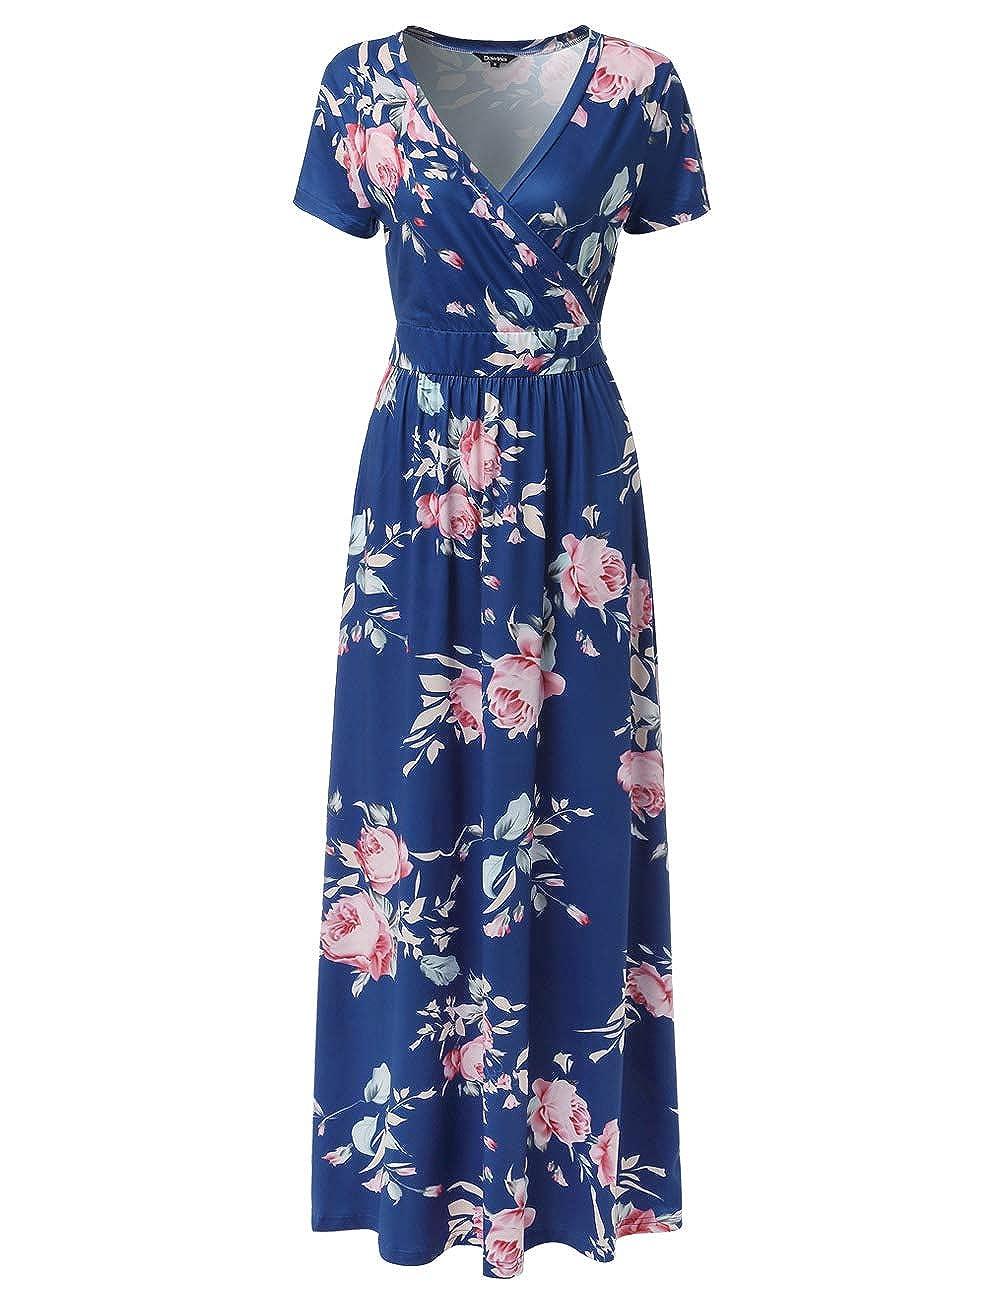 142c5005f1 Top 10 wholesale Sky Blue Womens Dress - Chinabrands.com